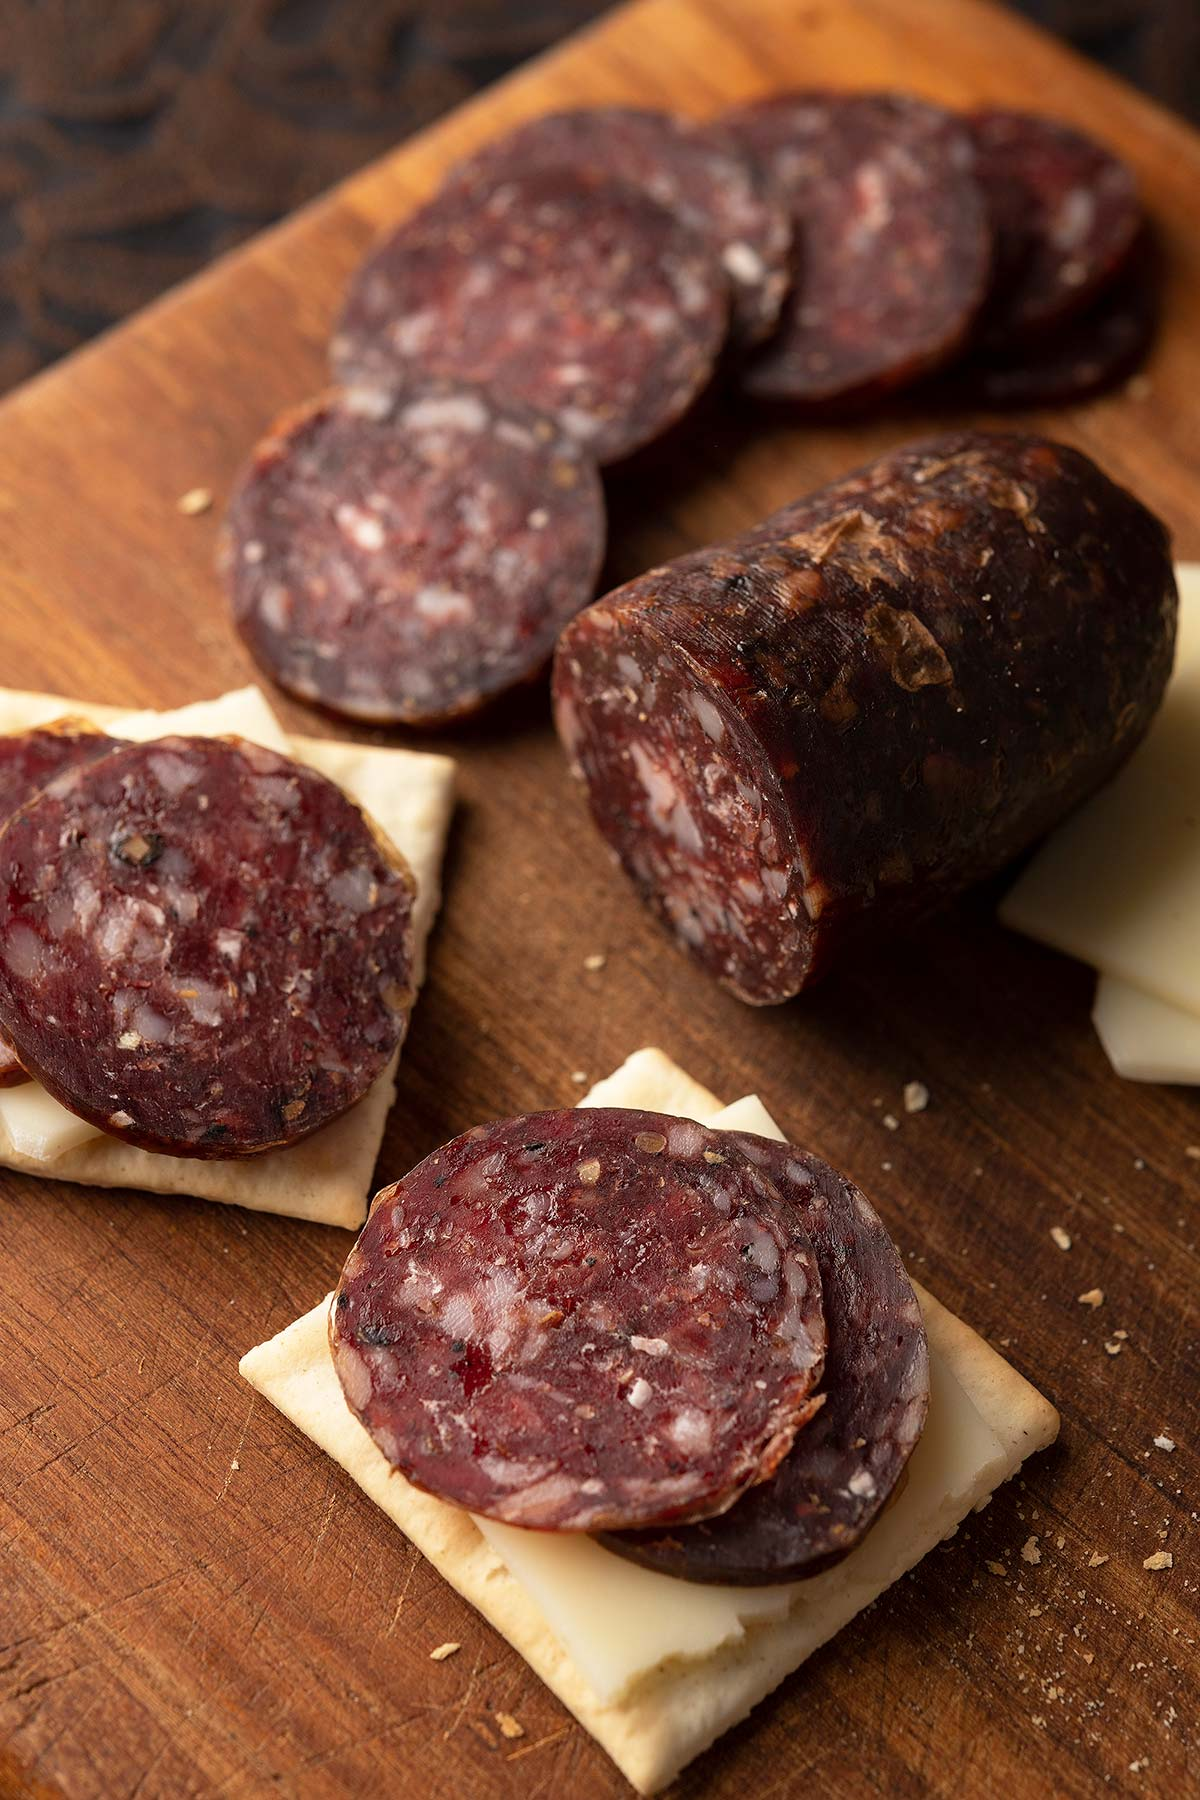 Venison summer sausage on crackers